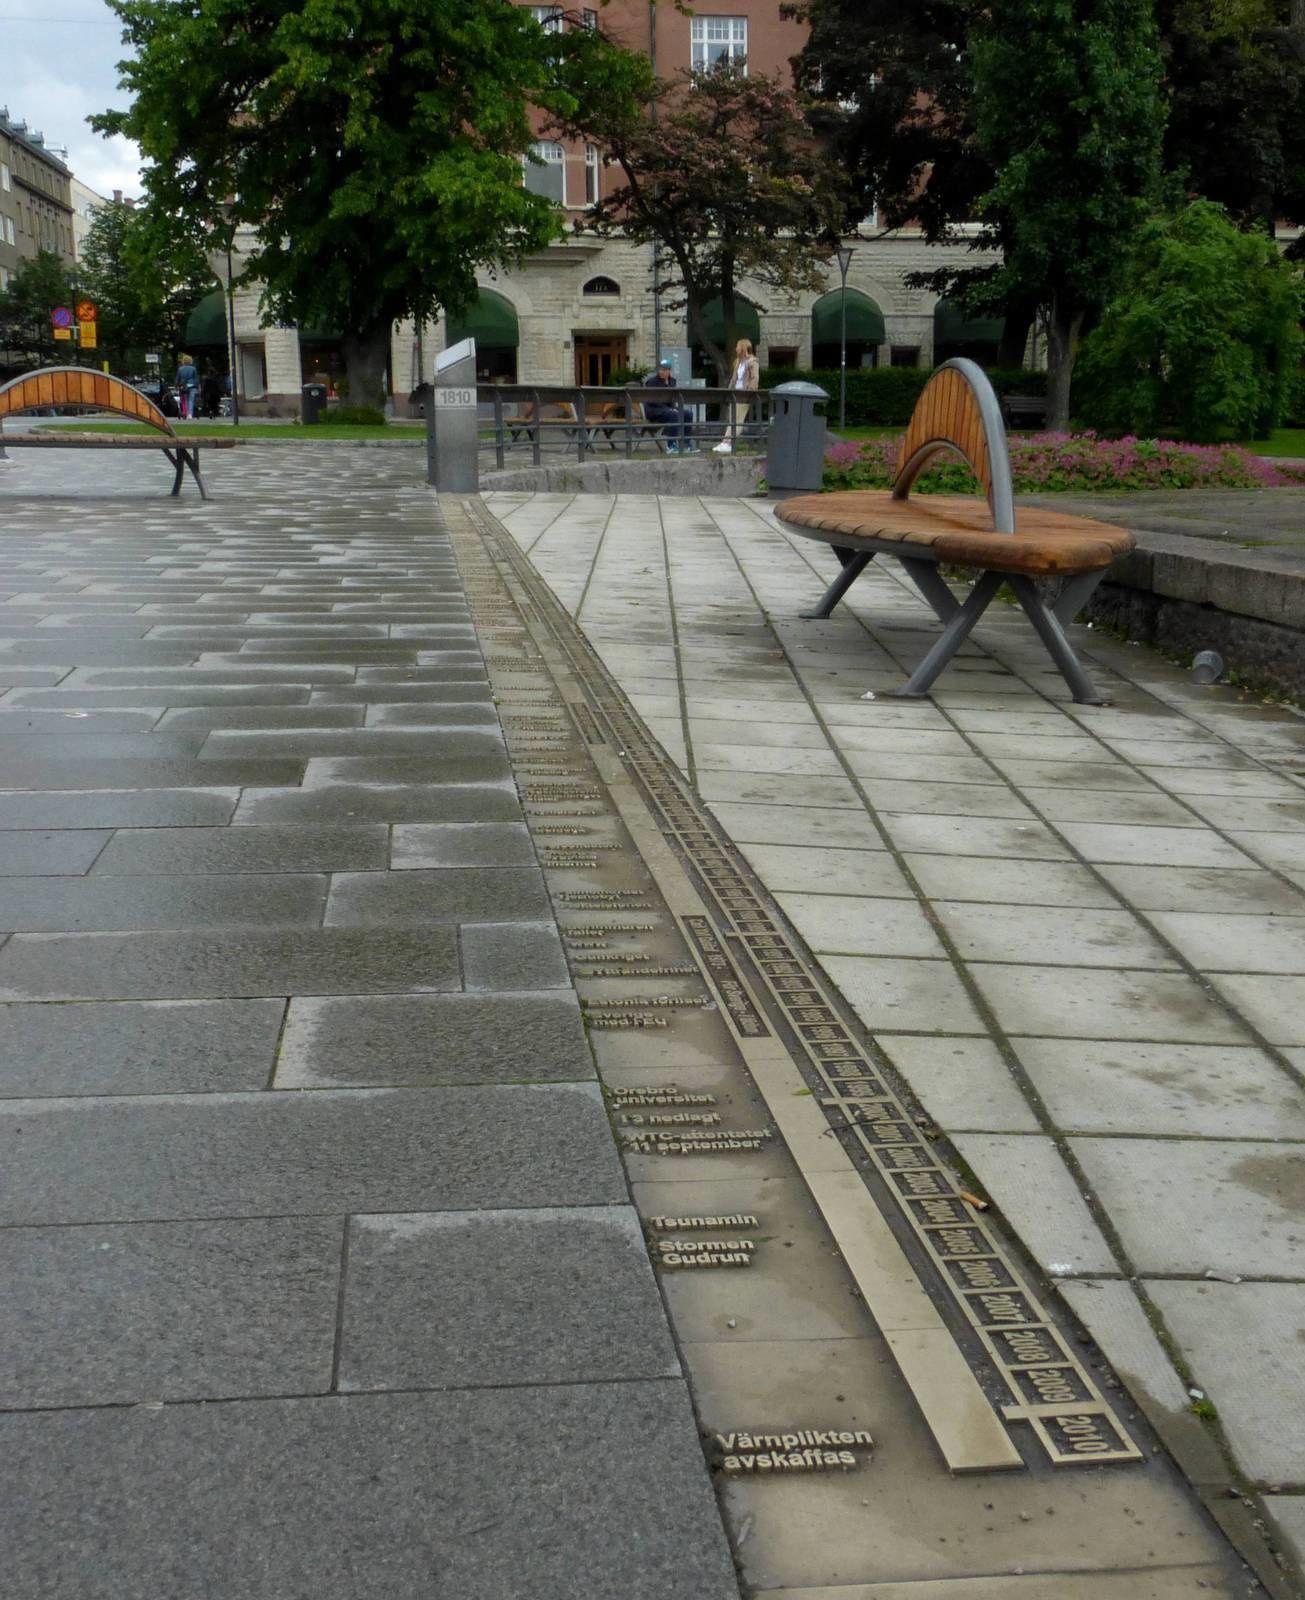 15 mètres d'histoire à Örebro